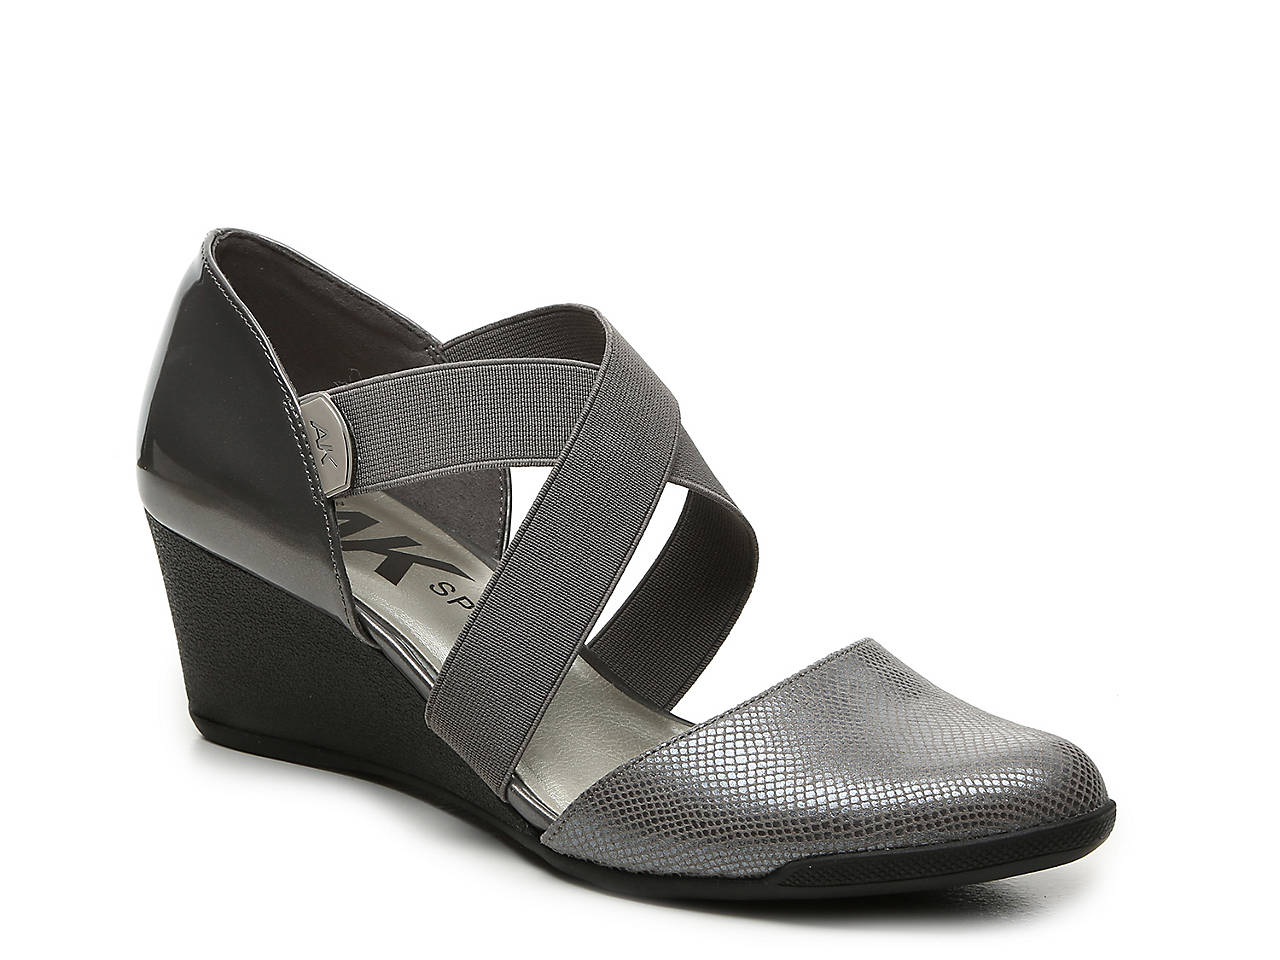 7bbd5ef9ff8 Anne Klein Sport Teaberry Wedge Pump Women s Shoes